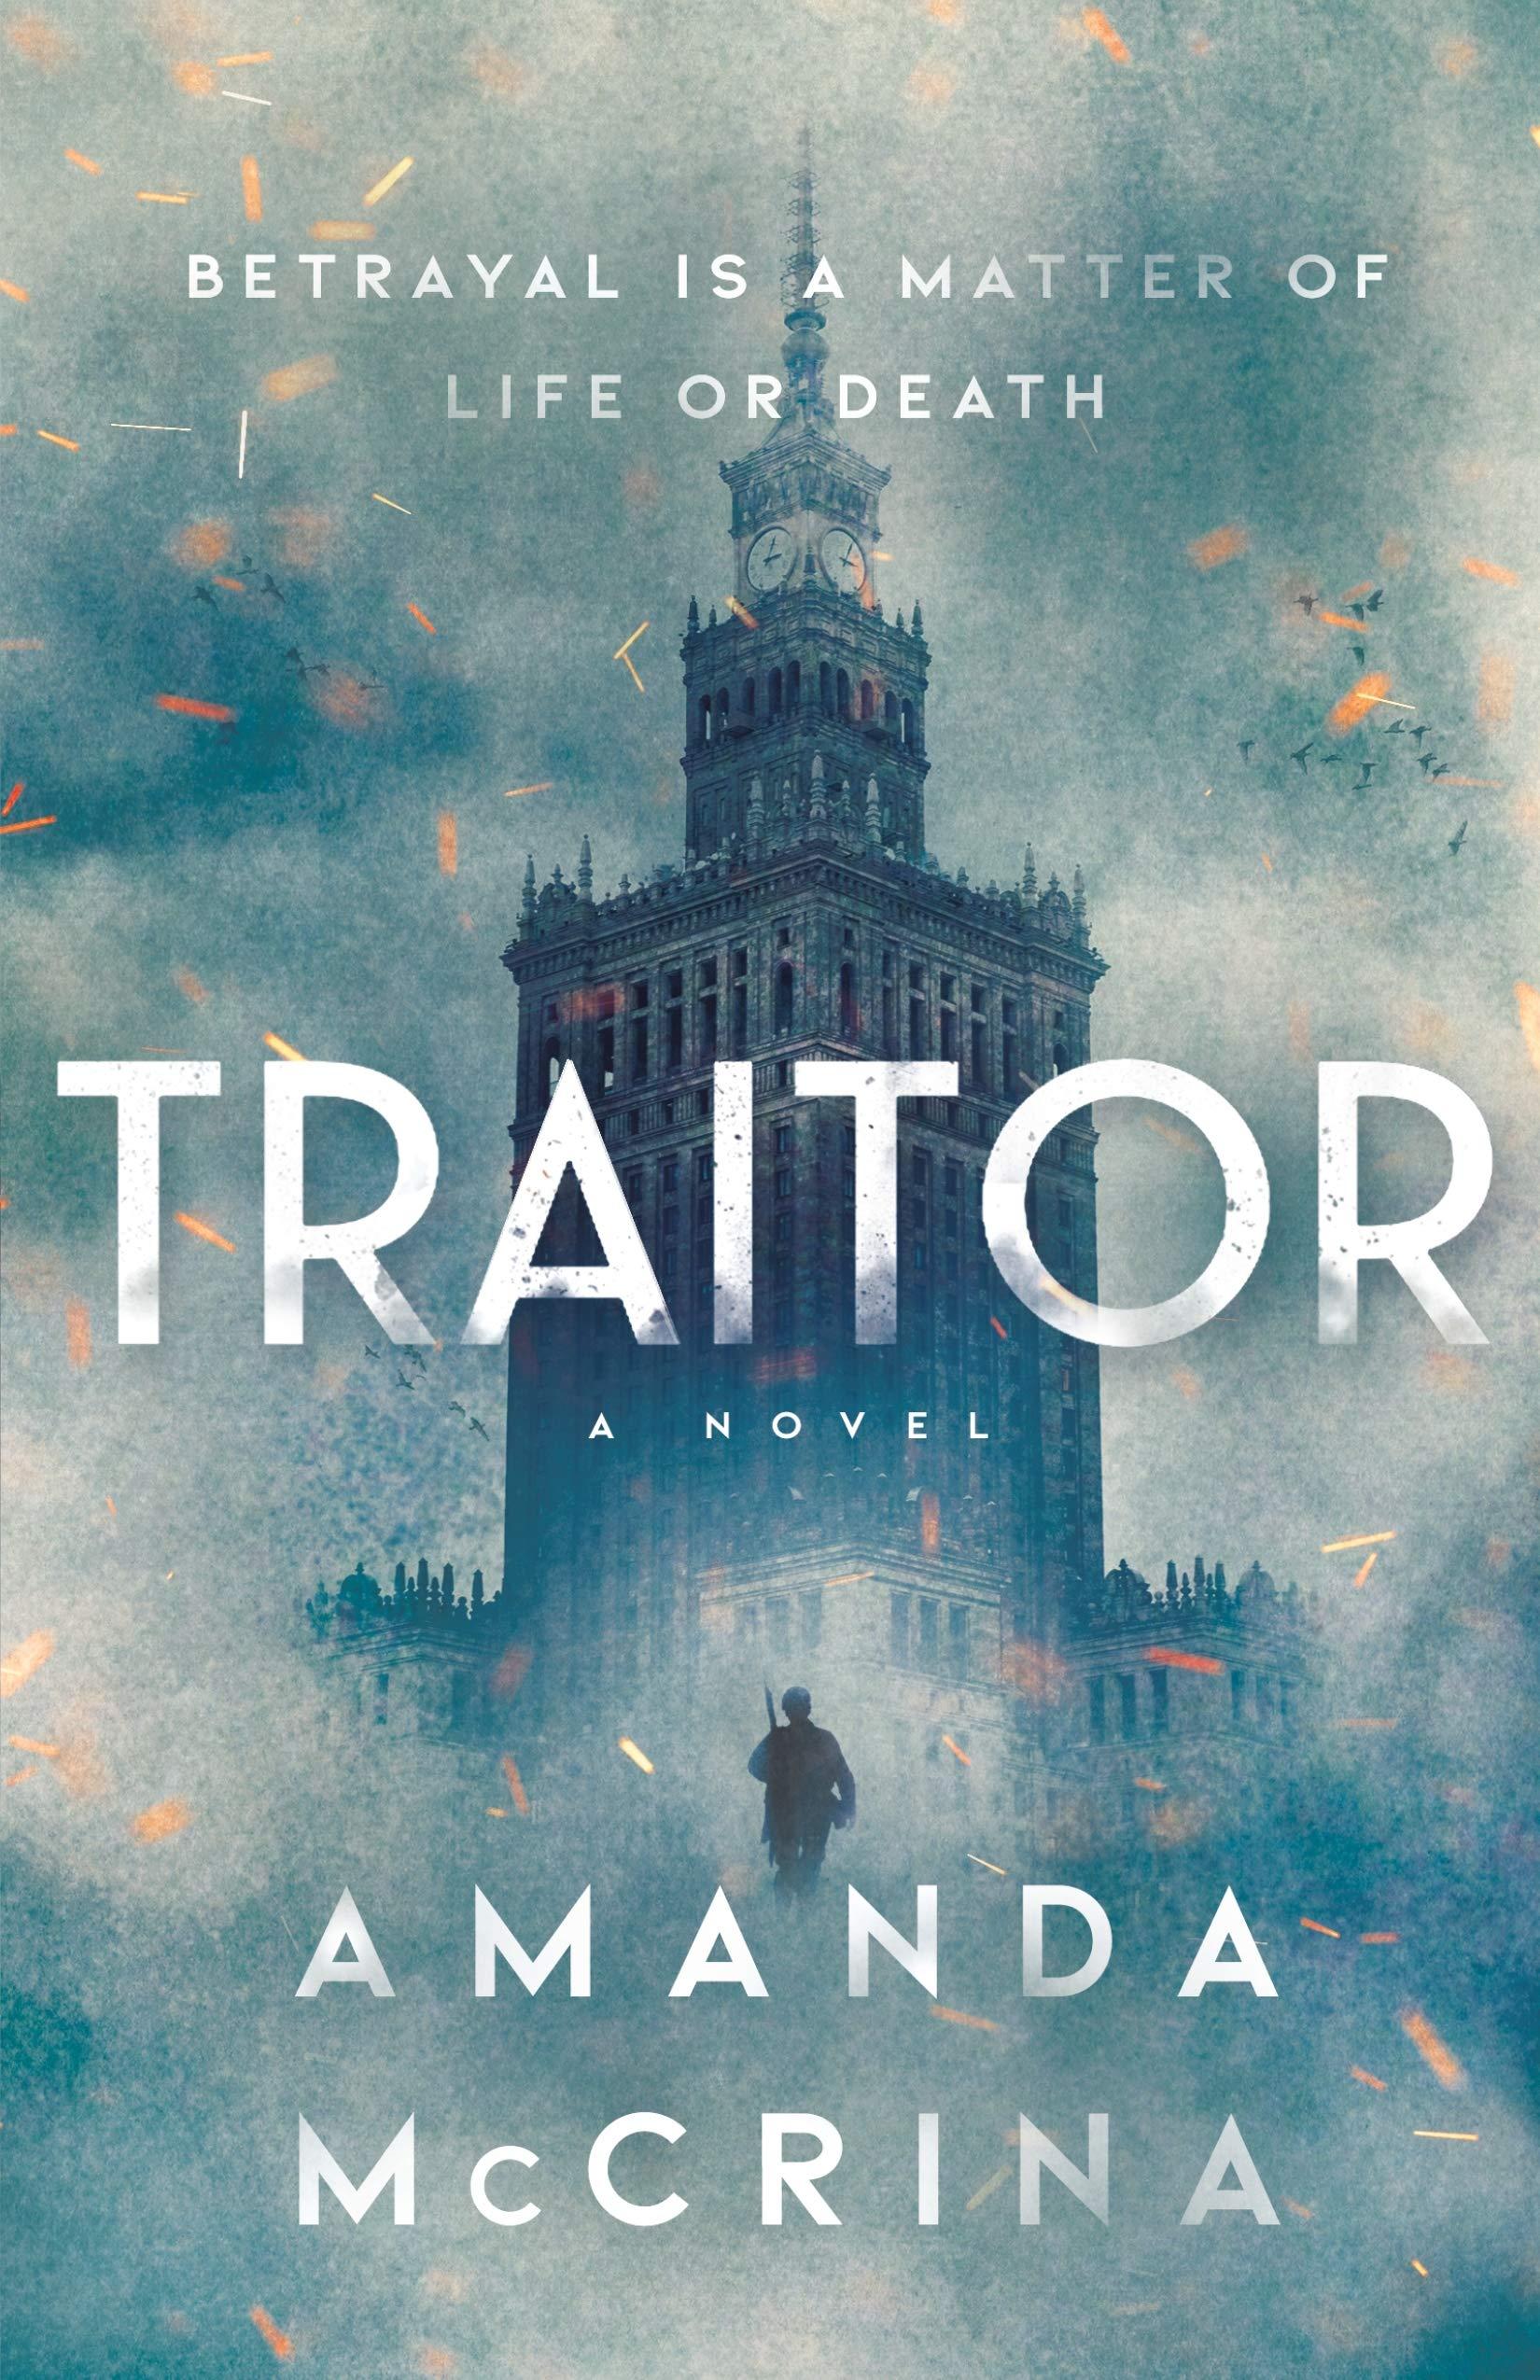 Traitor: A Novel of World War II